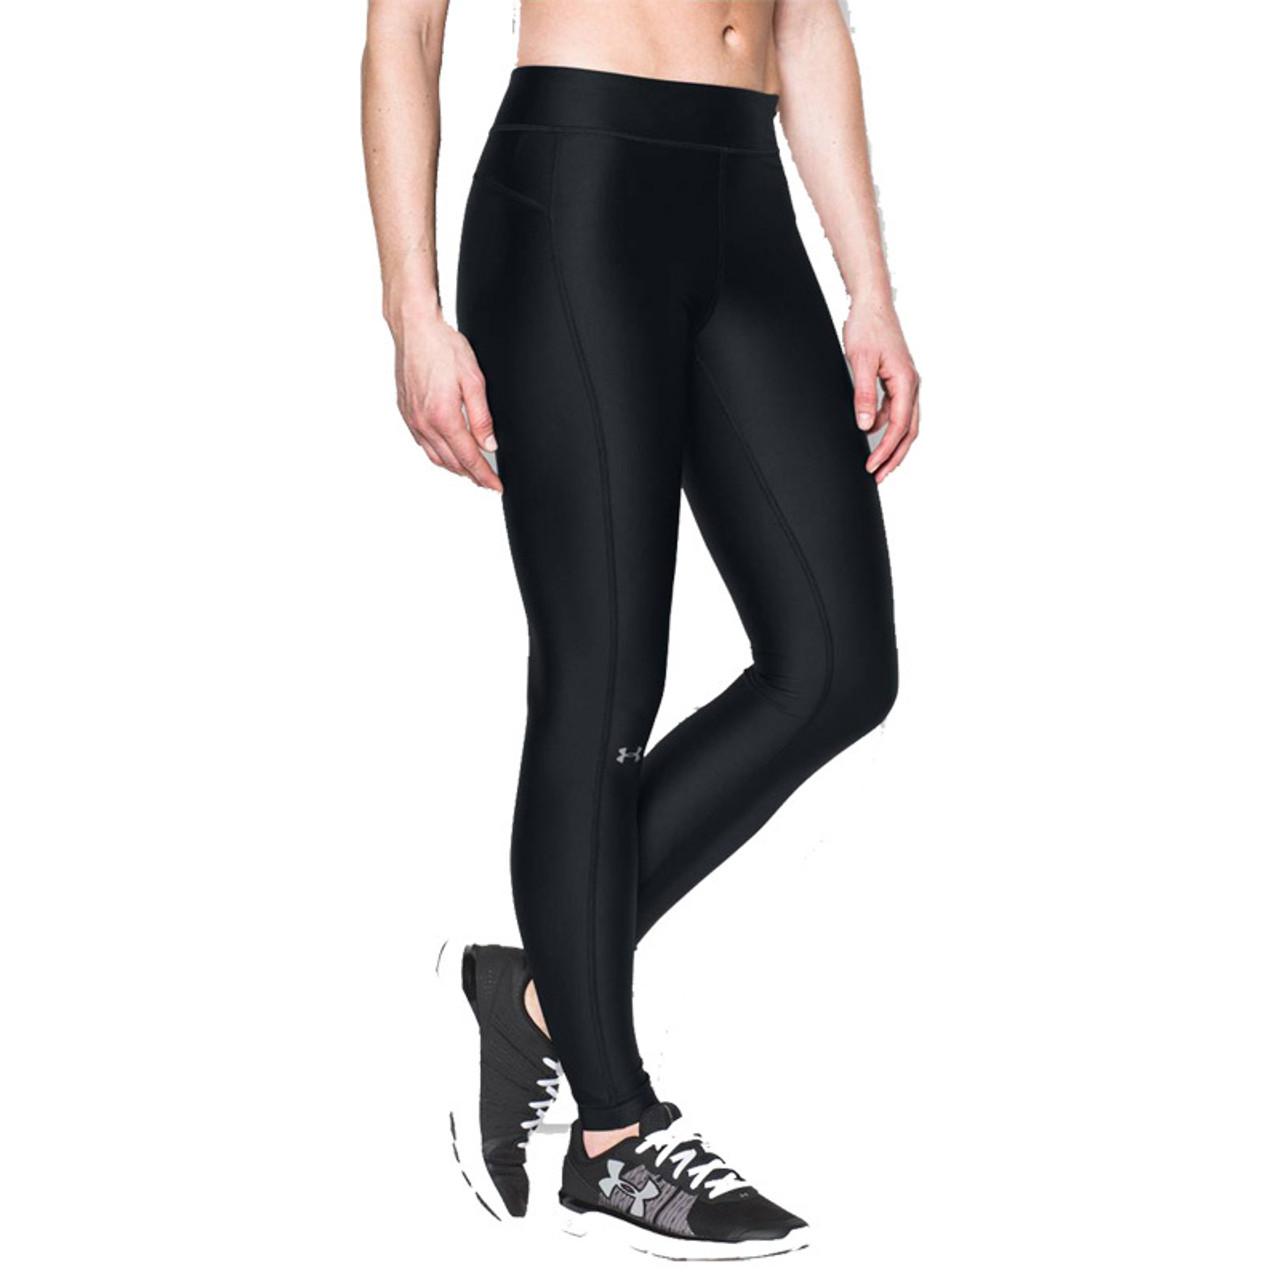 346a15cd7b Under Armour Women's Heatgear Armour Legging